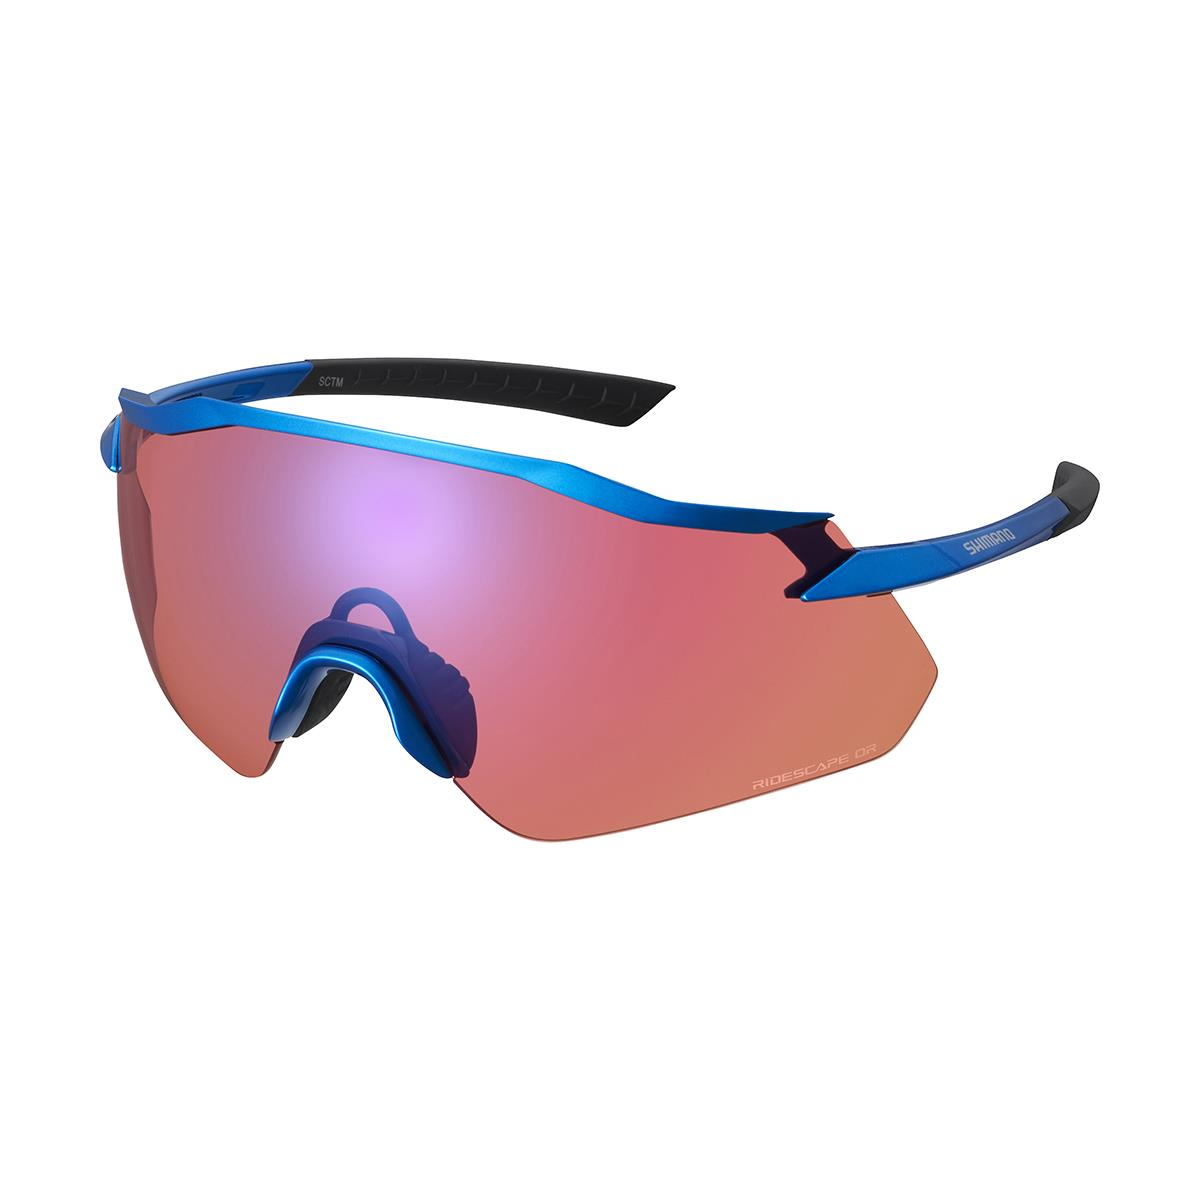 Equinox Sunglasses Blue / Ridescape OR MTB Lens